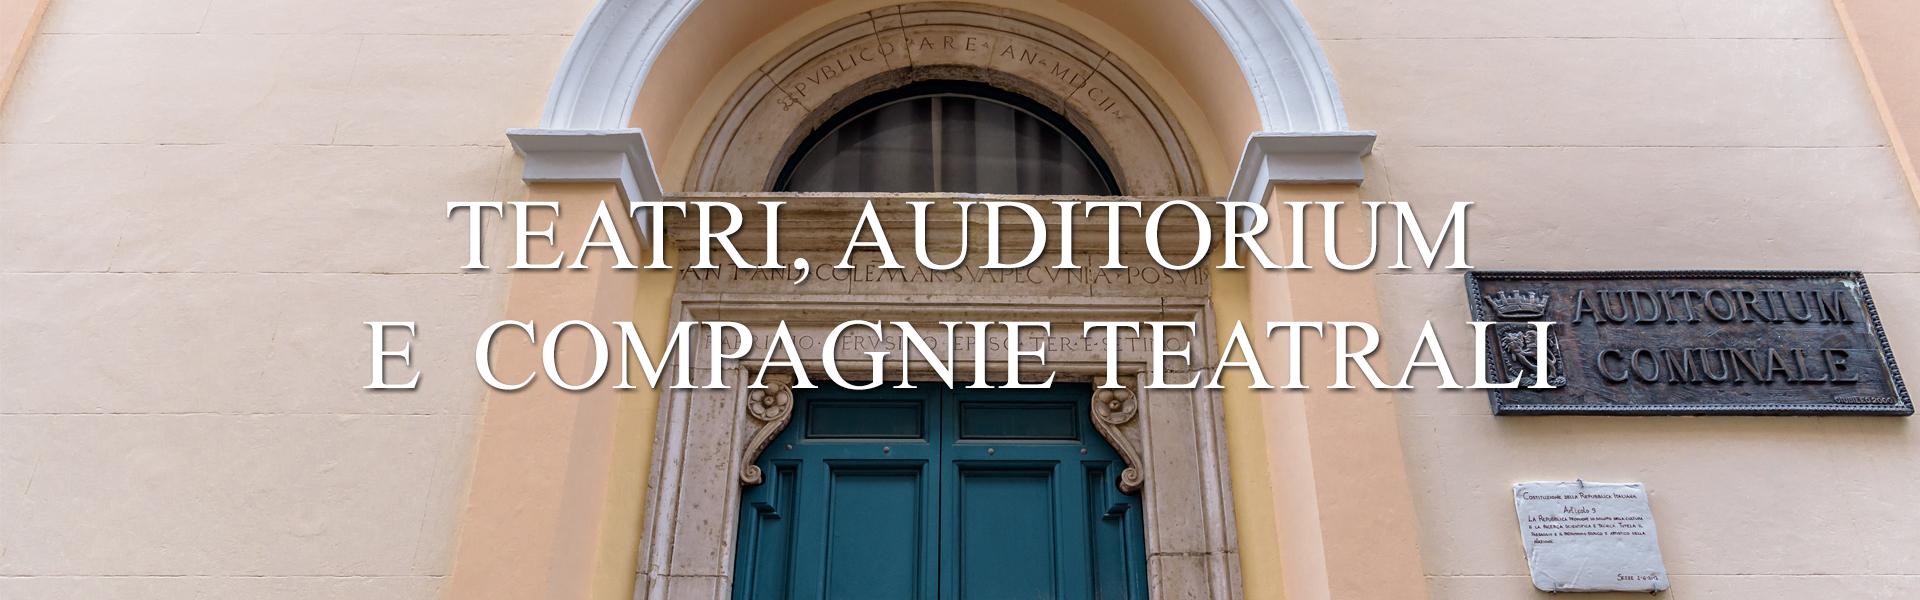 sezze-cultura-teatri-auditorium-e-compagnie-teatrali-cop-1920x600